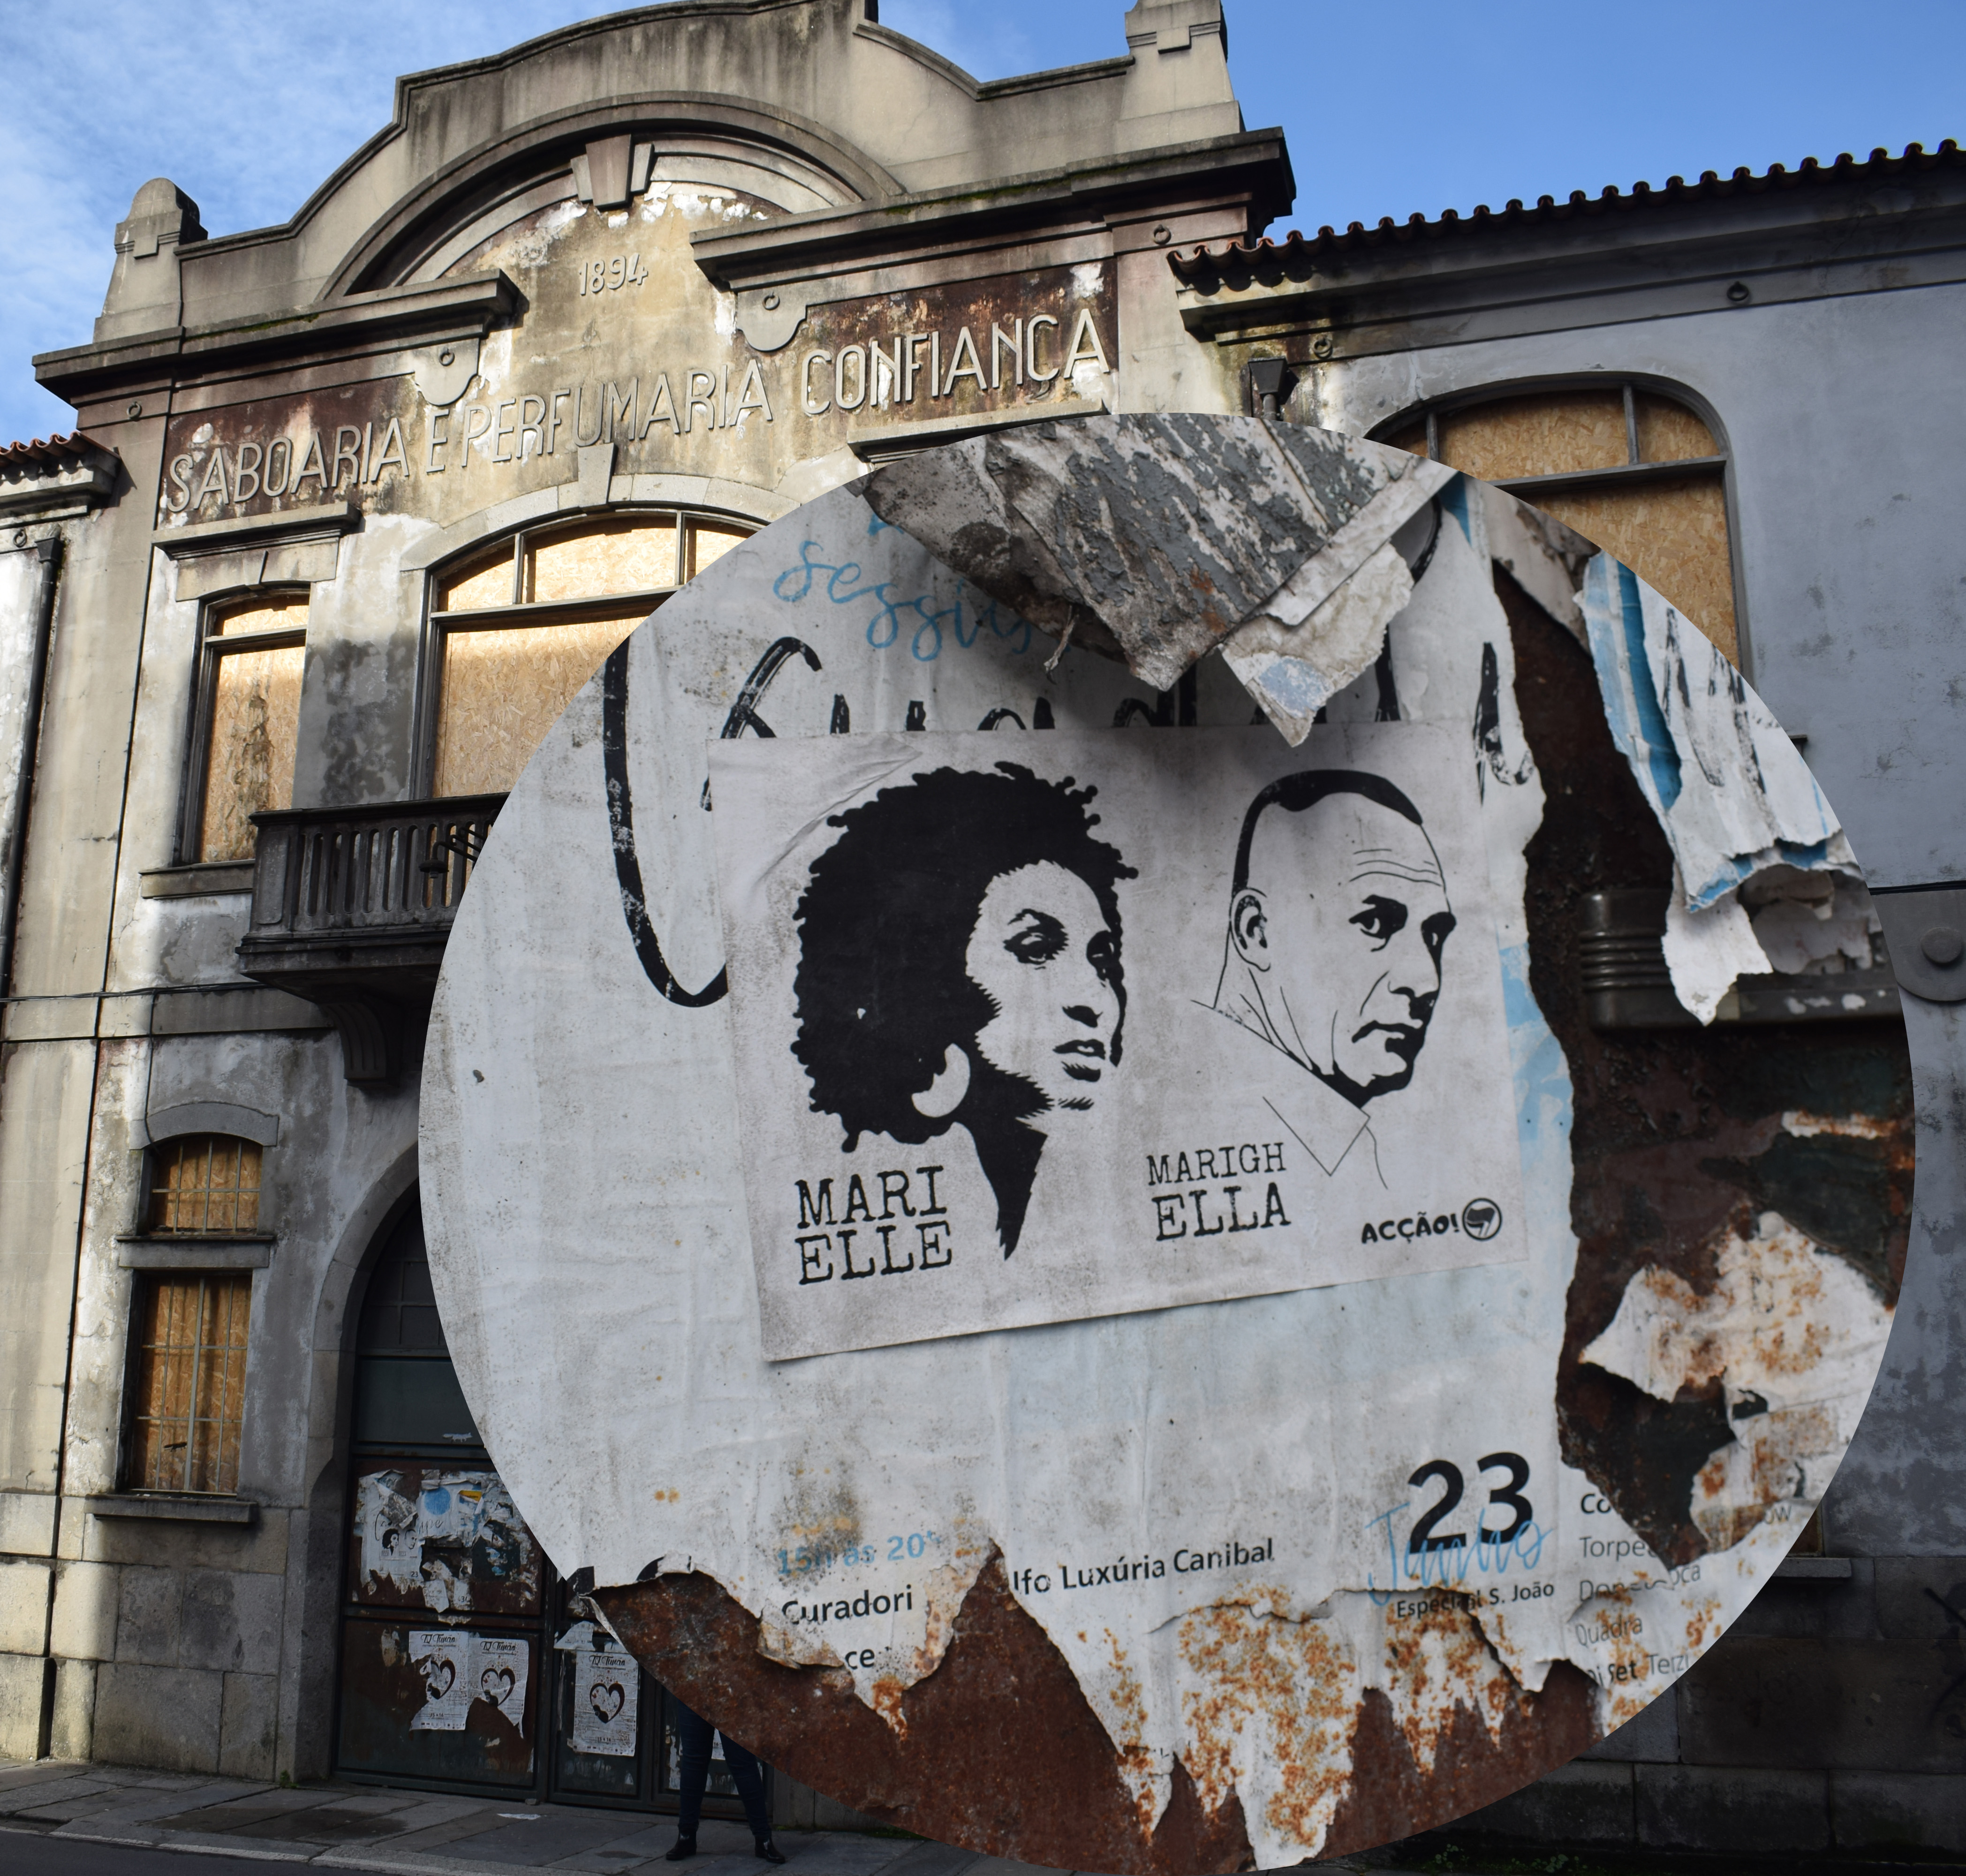 <h4>Confiança Marielle</h4><p>Figura 02: Cartaz Marielle Franco e Marighella, na porta da antiga Saboaria e Perfumaria Confiança</p>